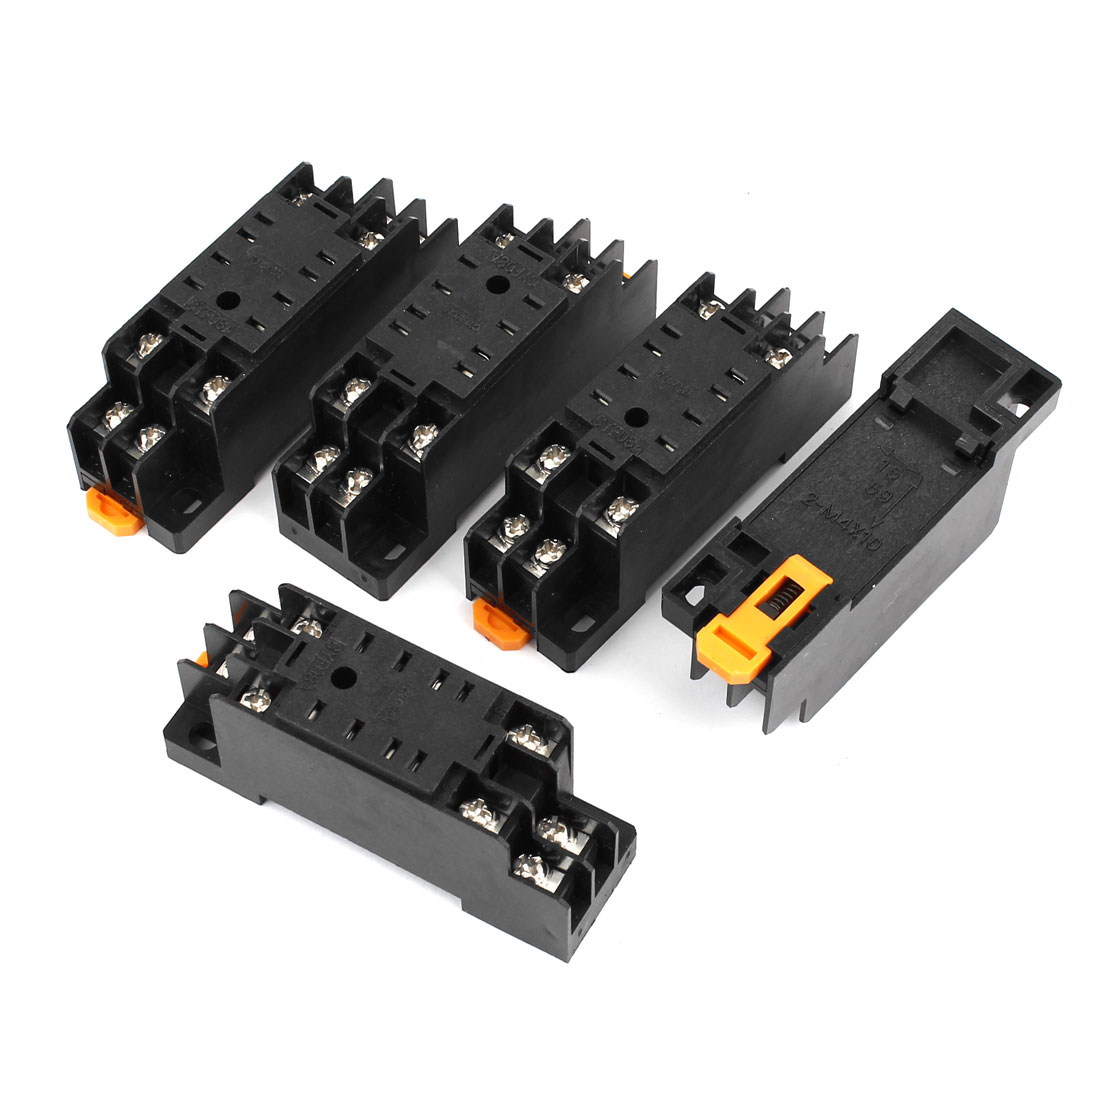 5pcs PF083A 8 Pins Screw Terminals Power Relay Socket Base for JTX-2C MK2P-I